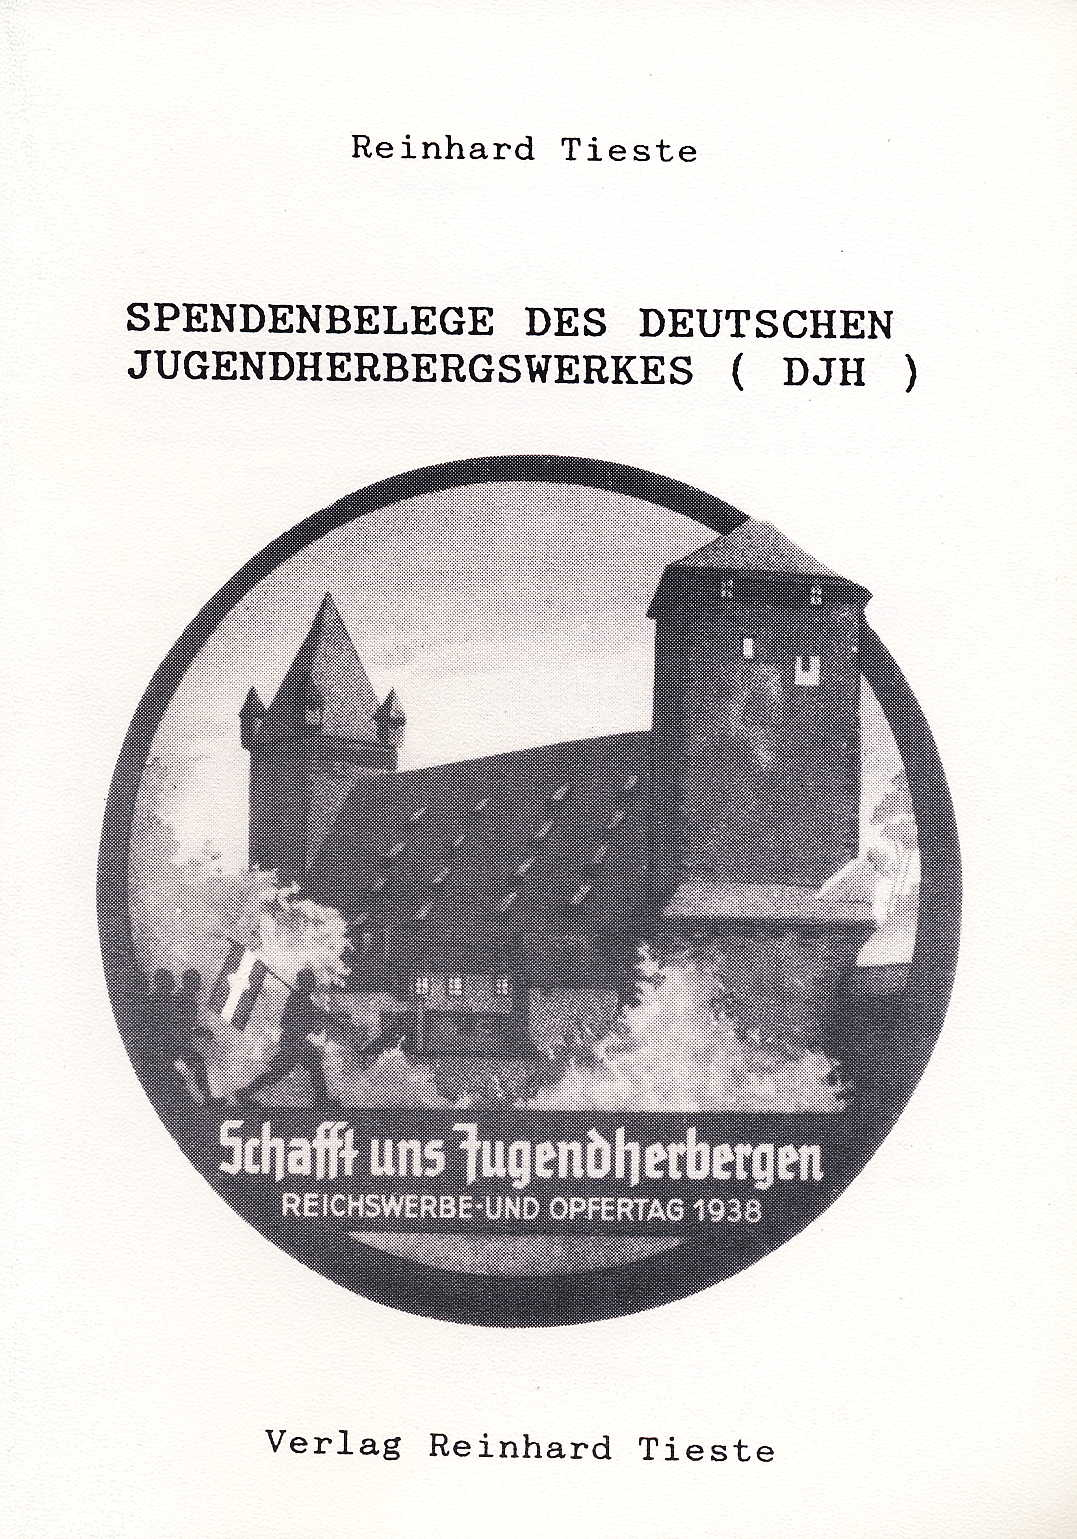 Tieste, Reinhard Spendenbelege des Deutschen Jugendherbergwerks